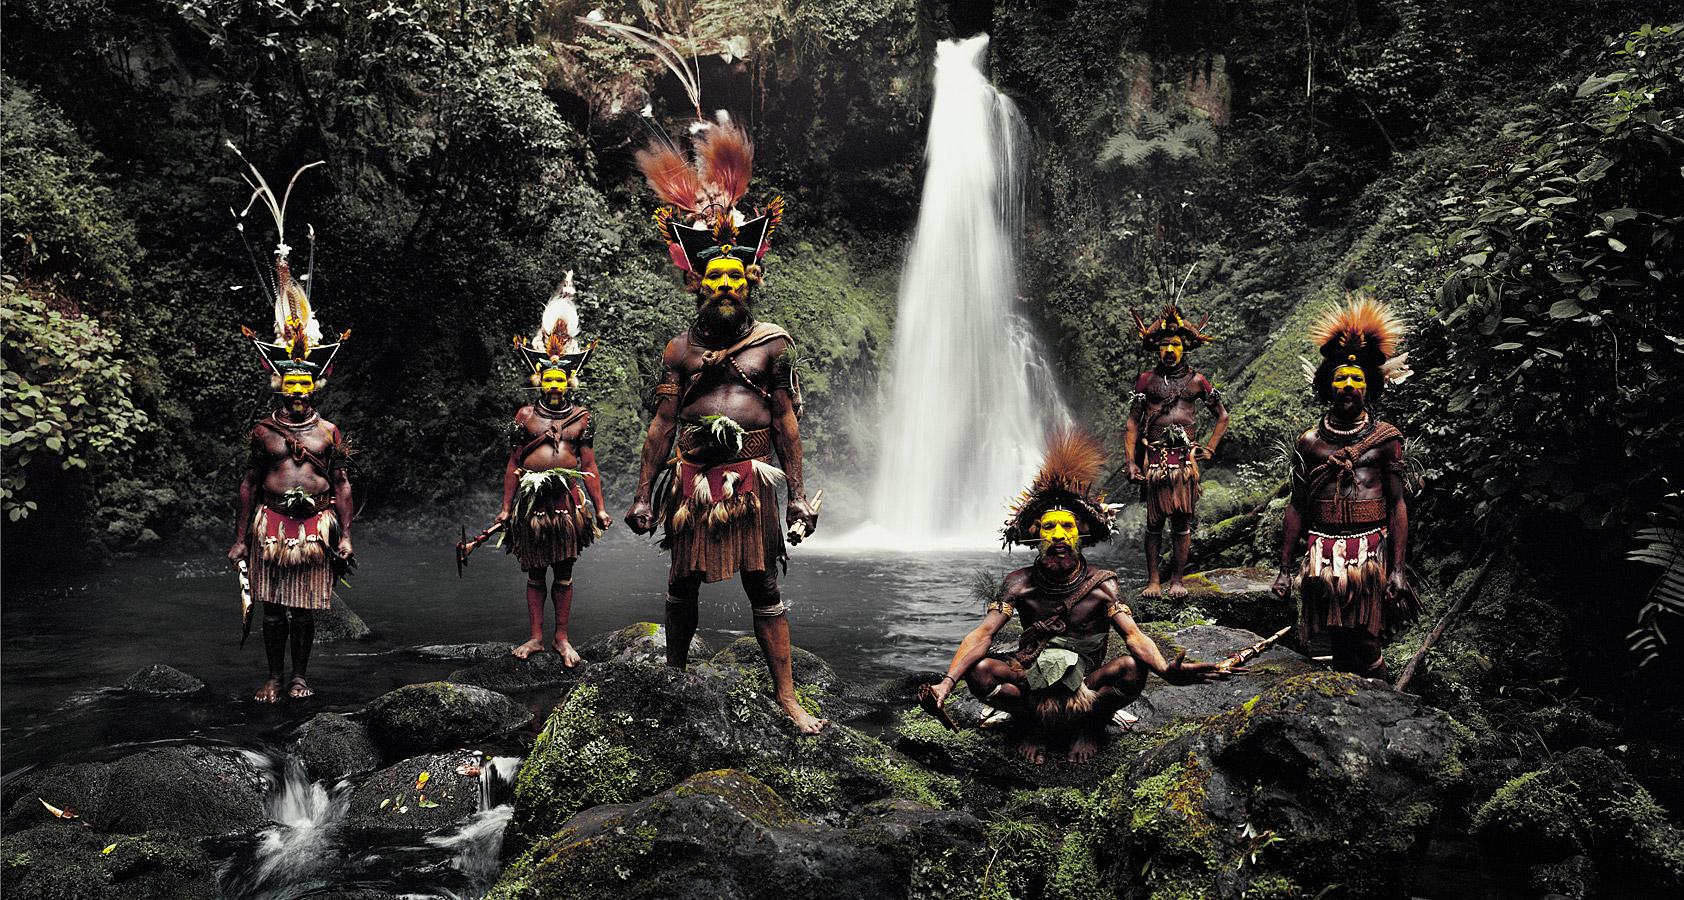 xv-66-tumbu-hangu-peter-hapiya-kati-hengene-steven-huli-wigmen-ambua-falls-tari-valley-papua-new-guinea-2010-available-in-62x-110cm-100x-180-cm-140x-260-cm-180x-360-cm